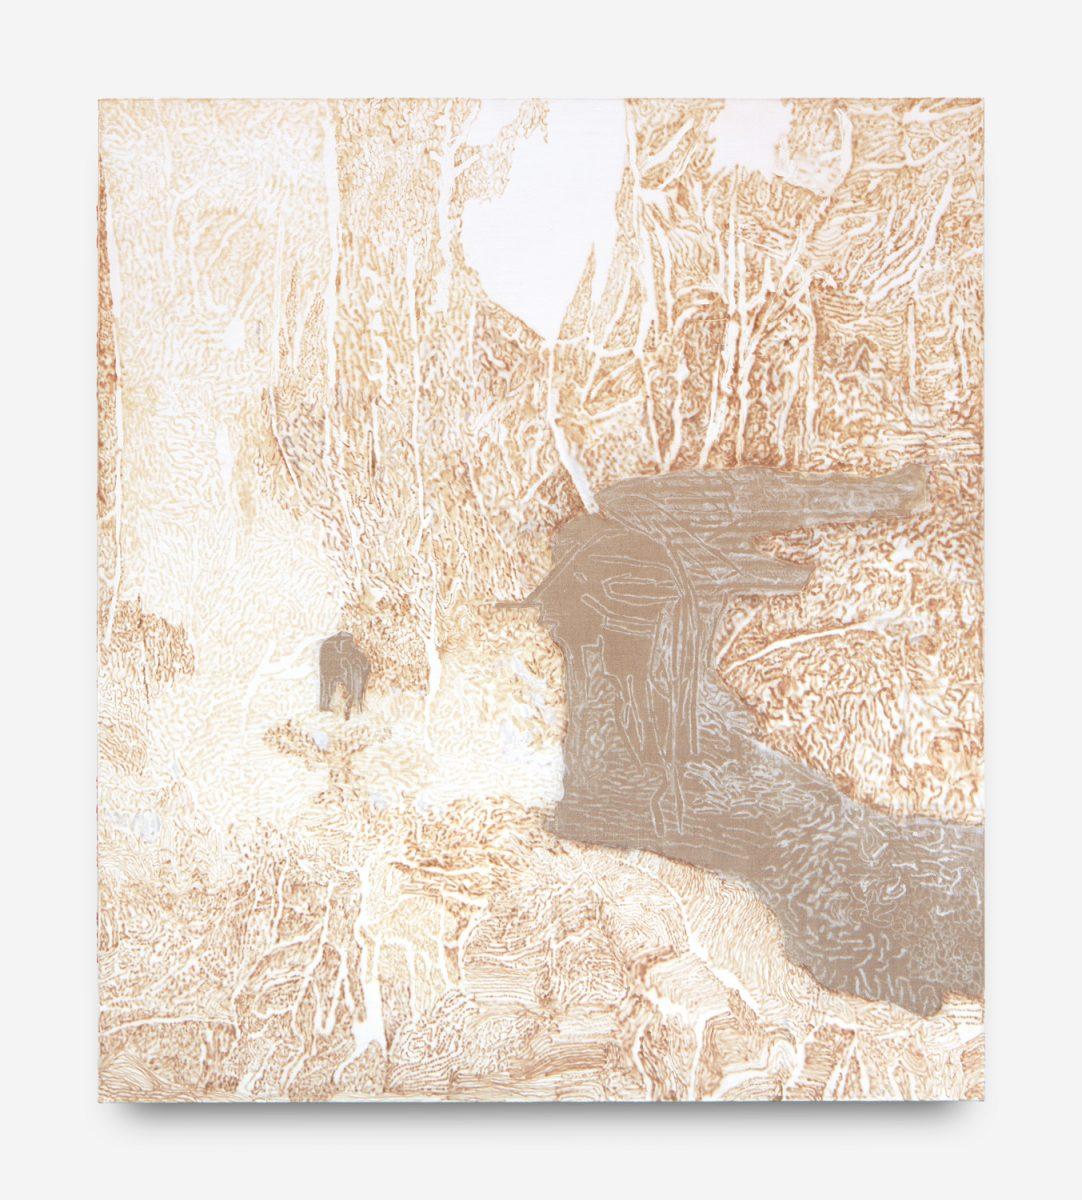 Kite Fungus Sznycel in Soviet Era, cotton and  acrylic needlework on  linen, 150 x 170 cm, 2018-